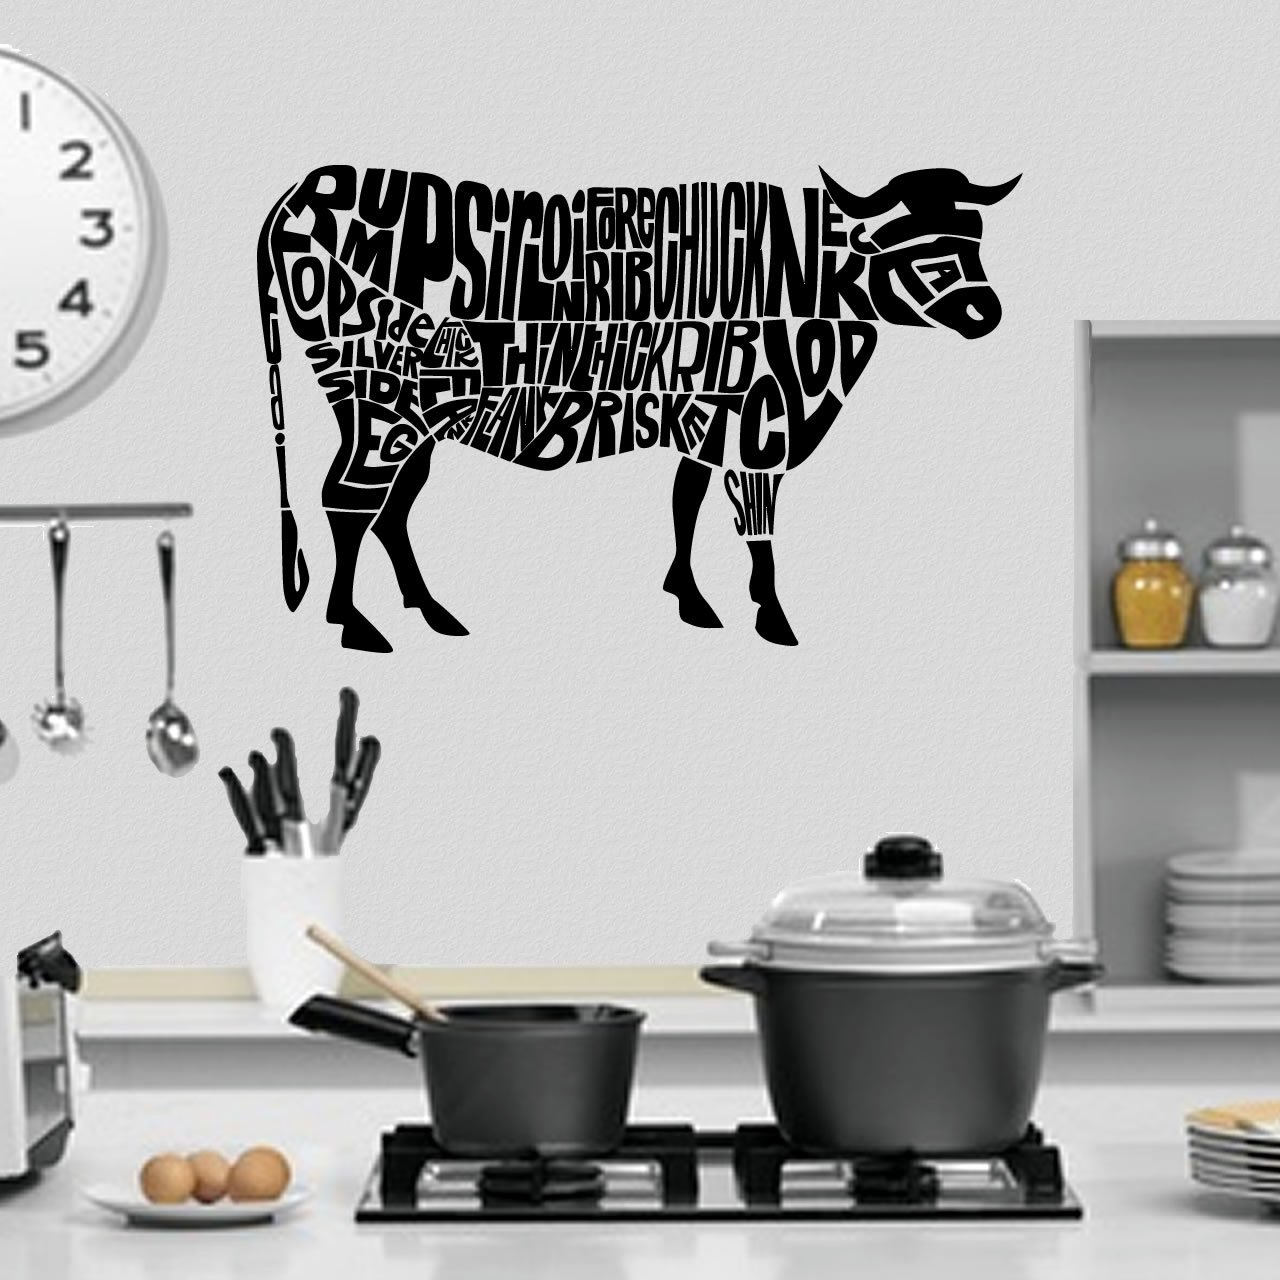 cow anatomy cuts of beef kitchen wall sticker world of wall cow anatomy cuts of beef kitchen wall sticker world of wall stickers